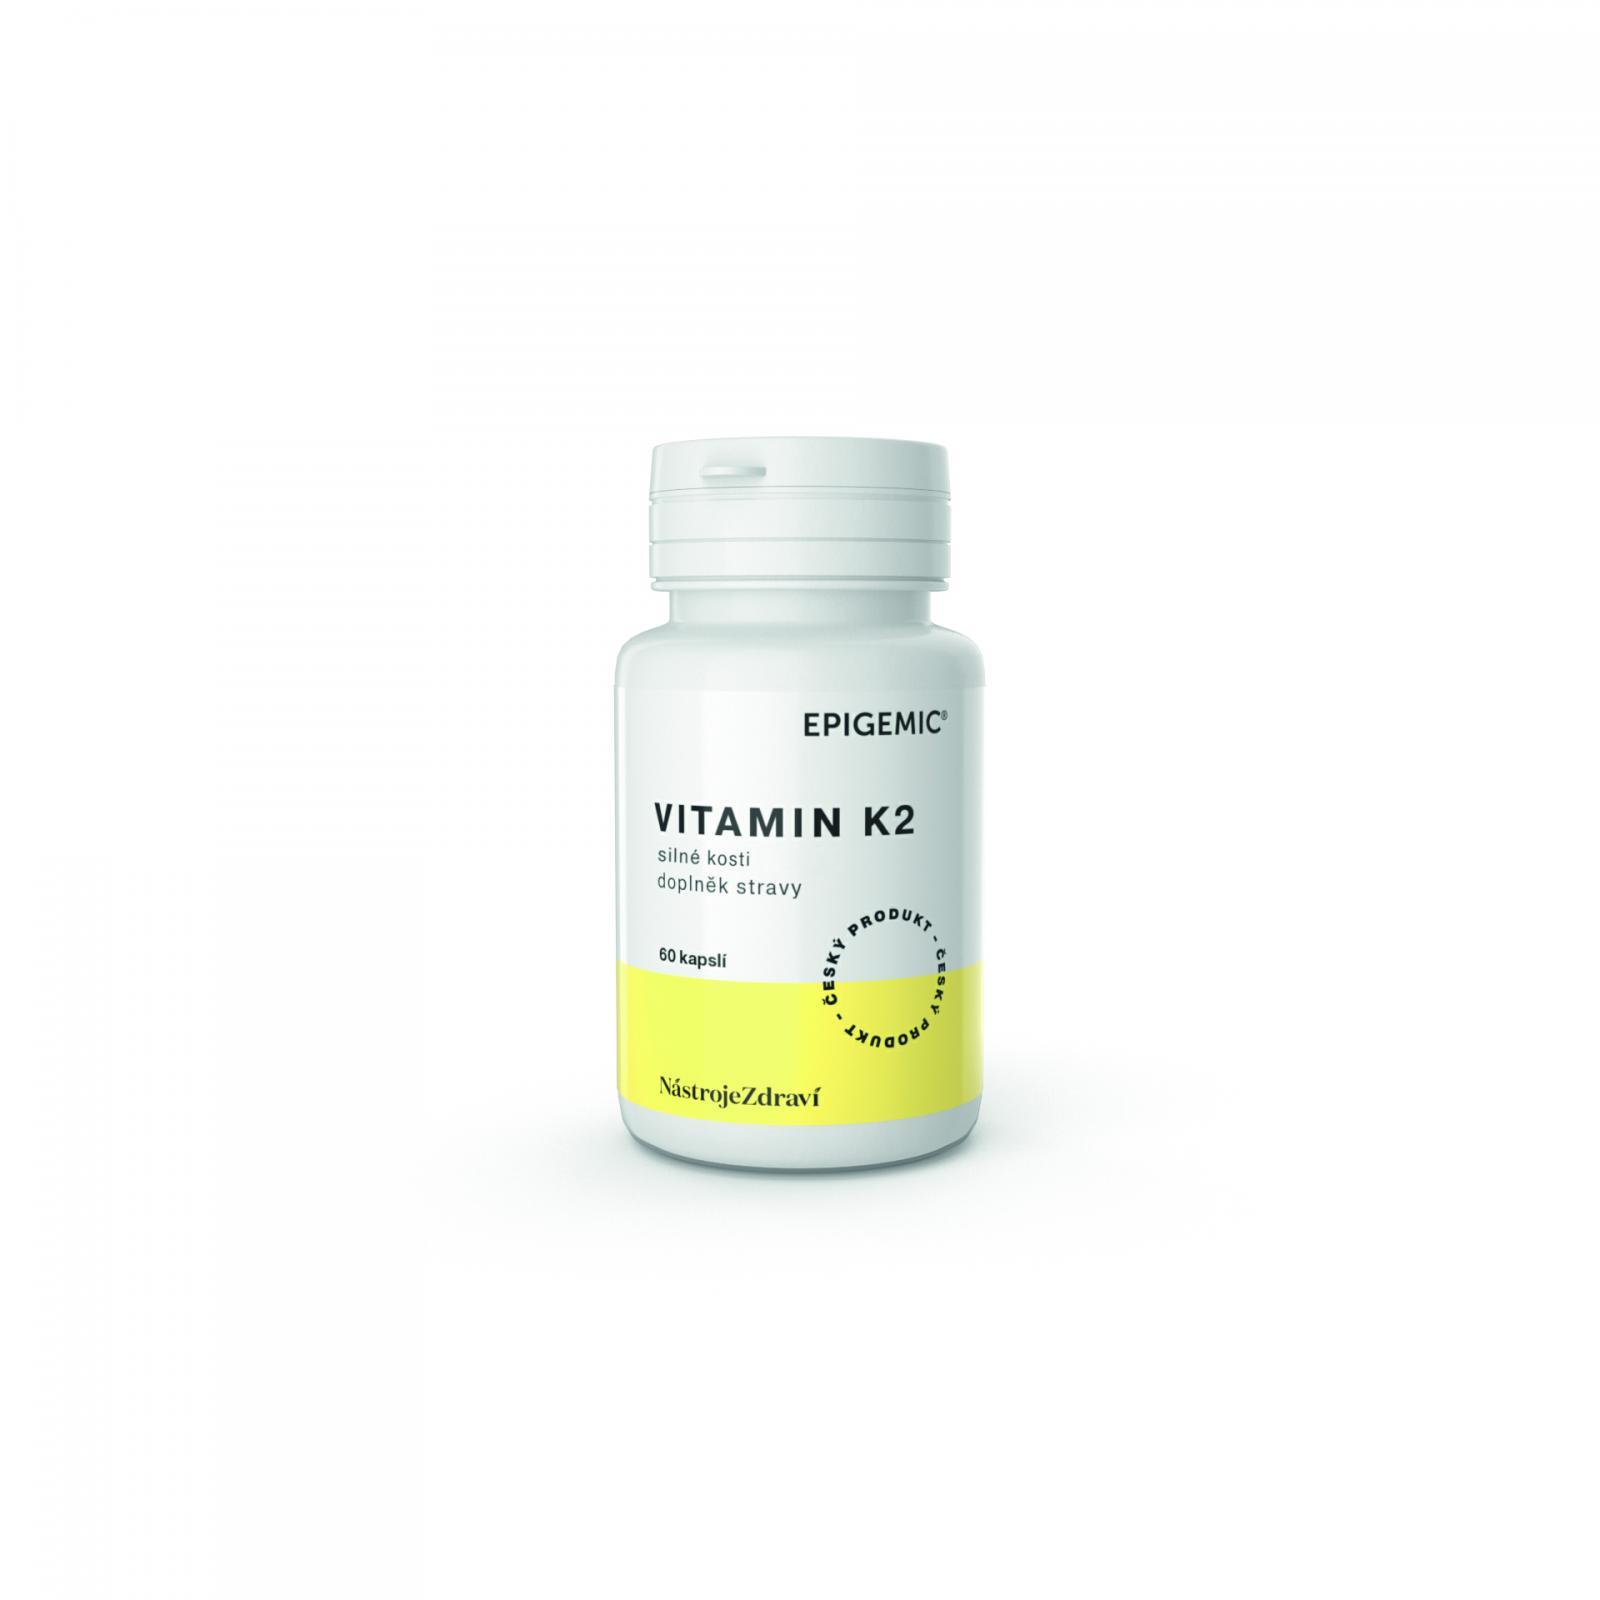 Epigemic Vitamin K2, kapsle 15 g, 60 ks